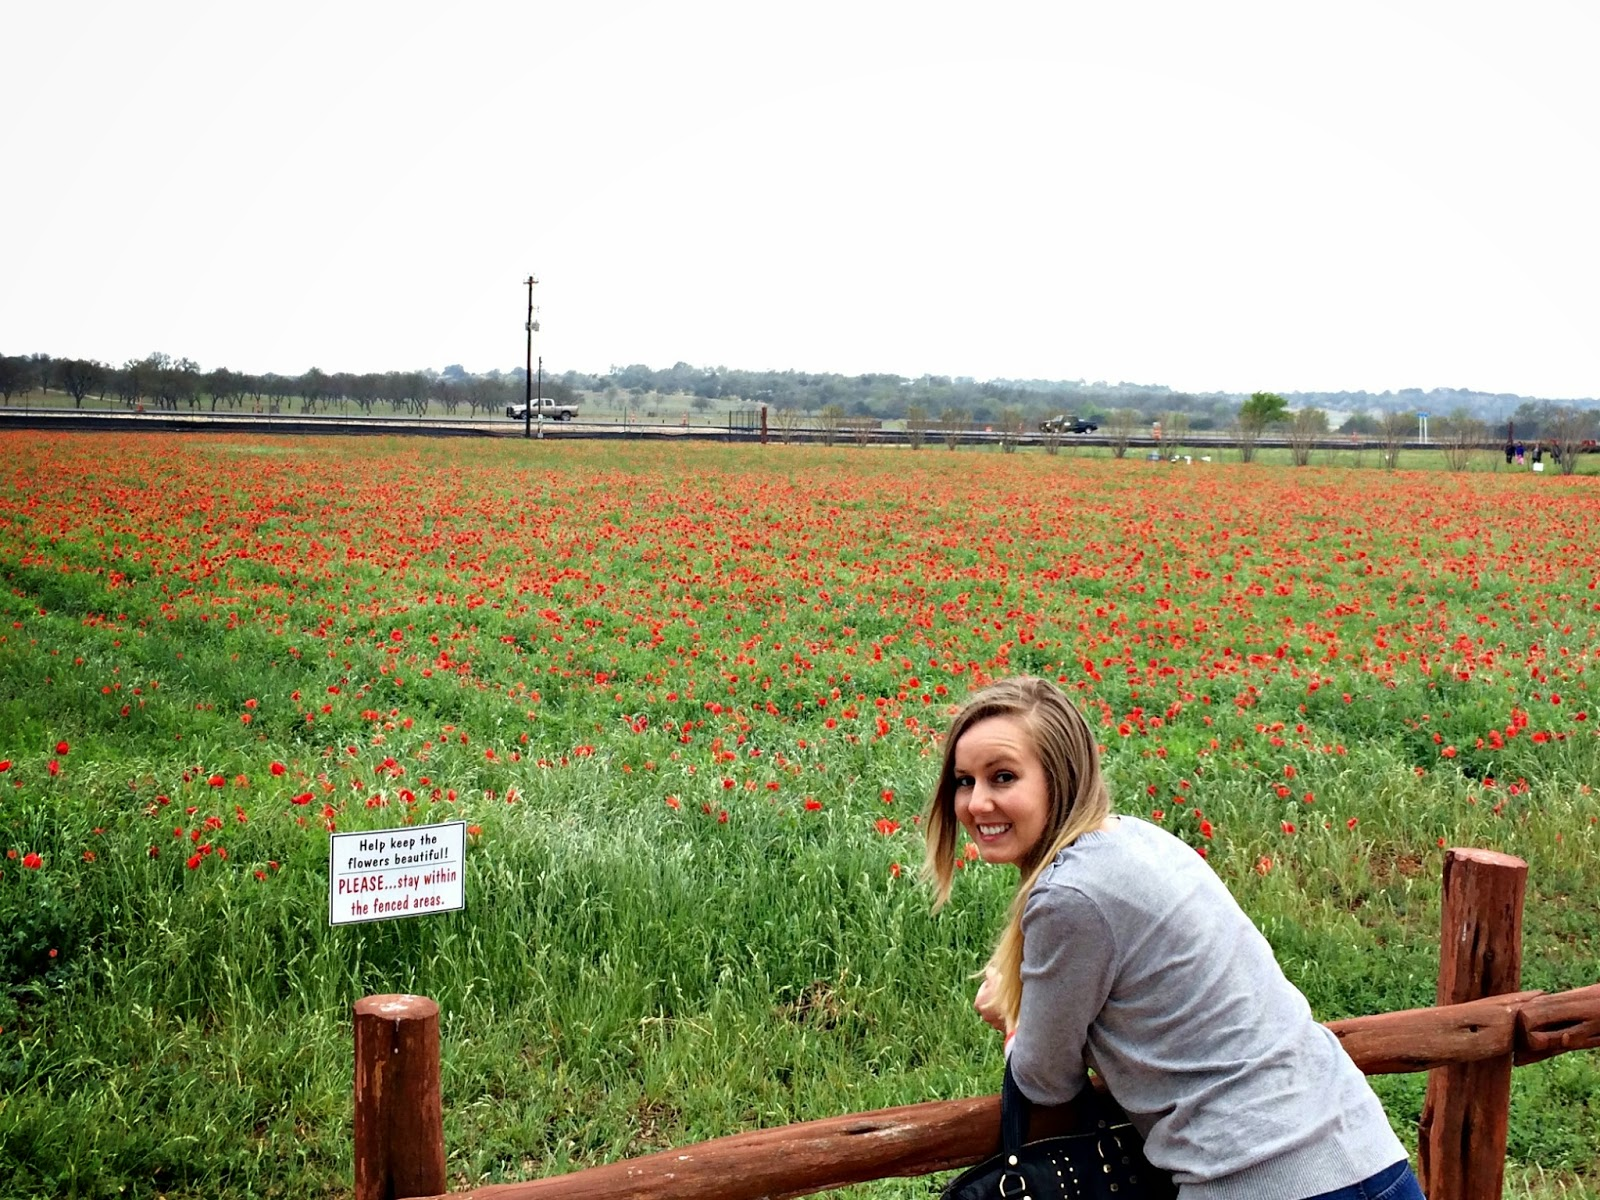 Texas poppies